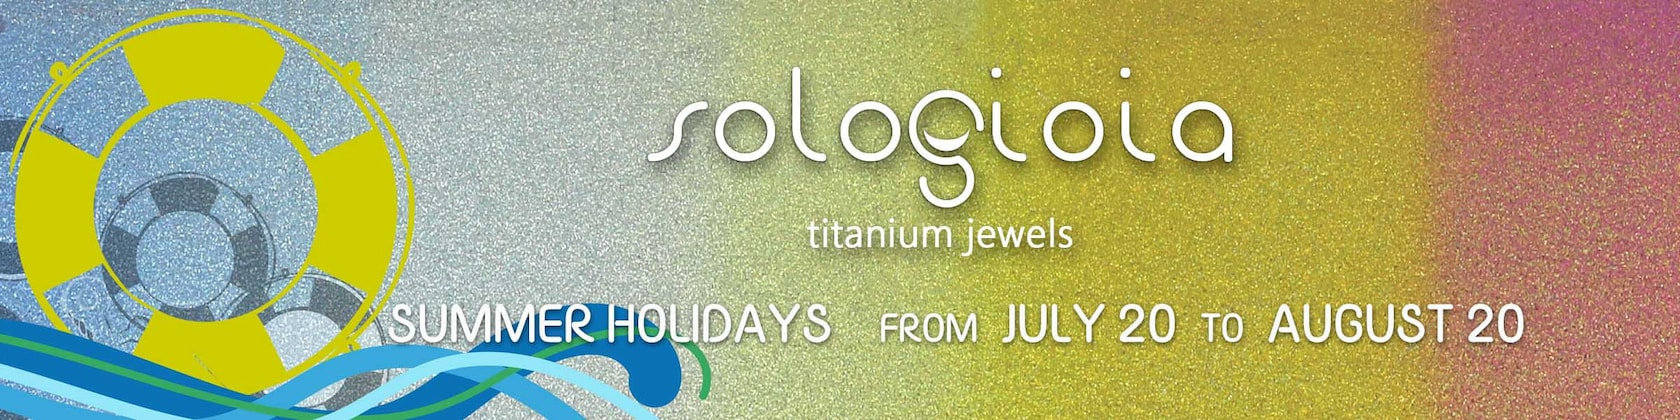 Etsy Sologioia Pure De Jewels Hypoallergenic Titanium En XZwkTPuOil